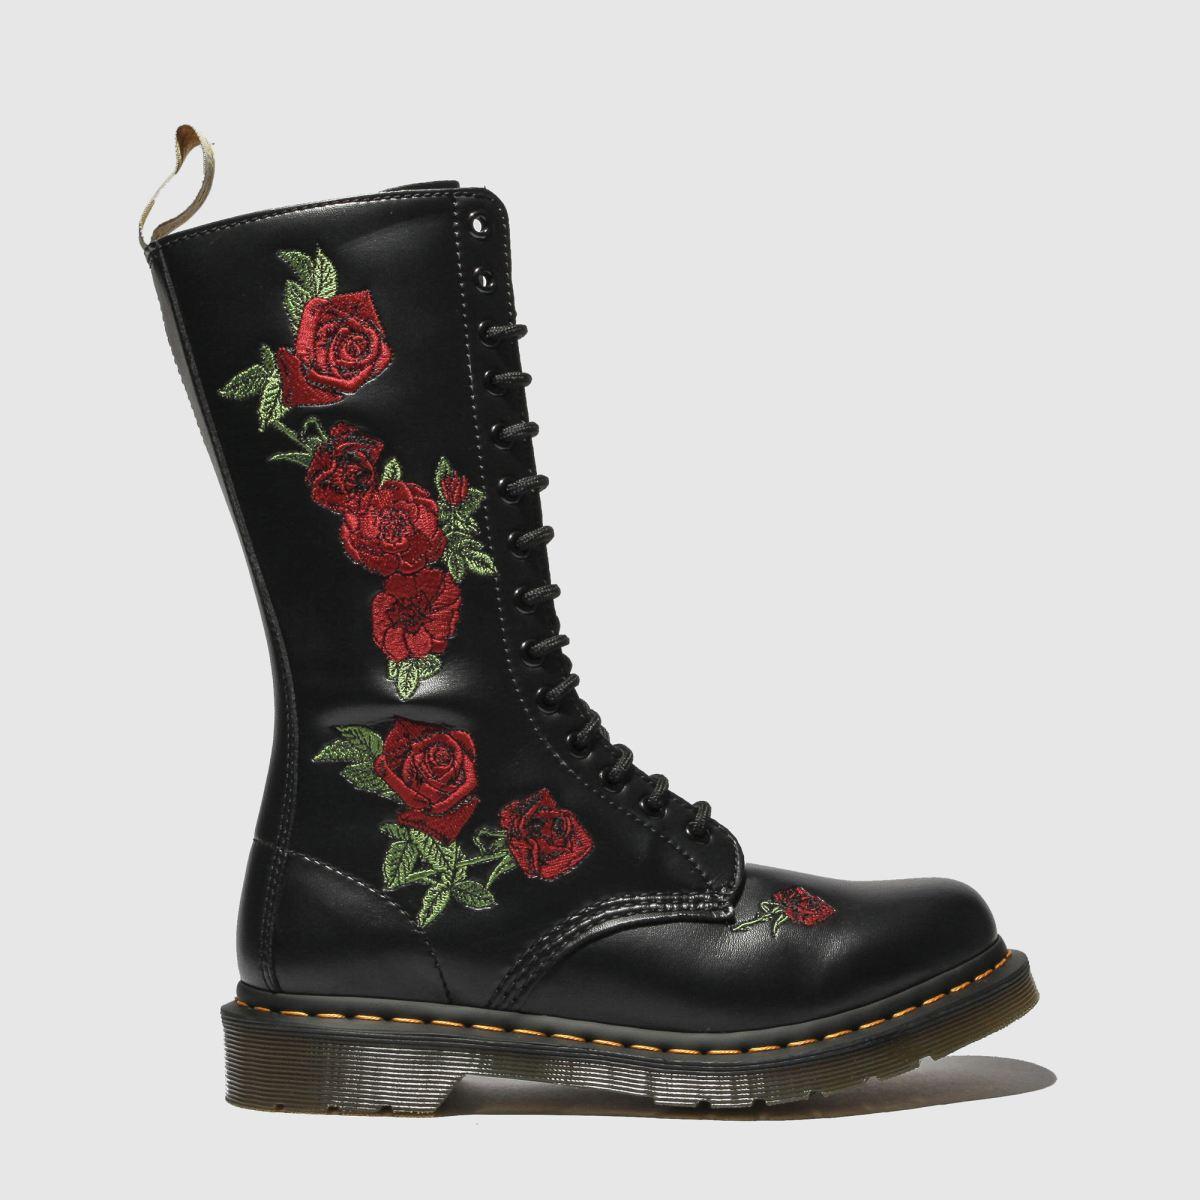 Dr Martens Black & Red 1914 Vegan Vonda Boots